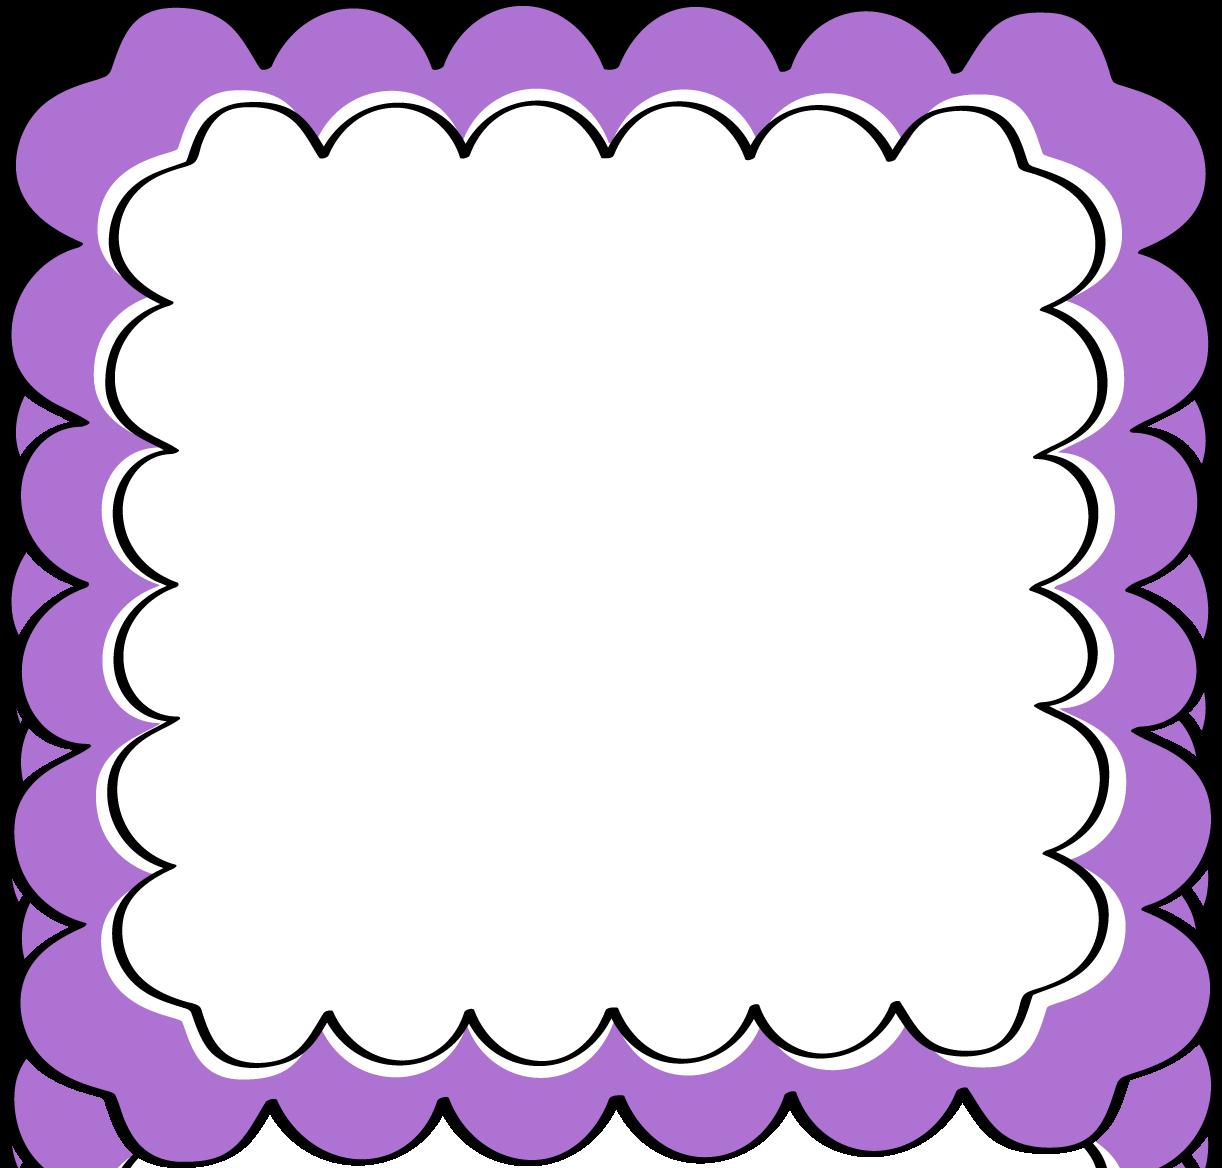 amazing clip art purple and black frame page borders design rh pinterest com purple flower border clip art purple border clip art free